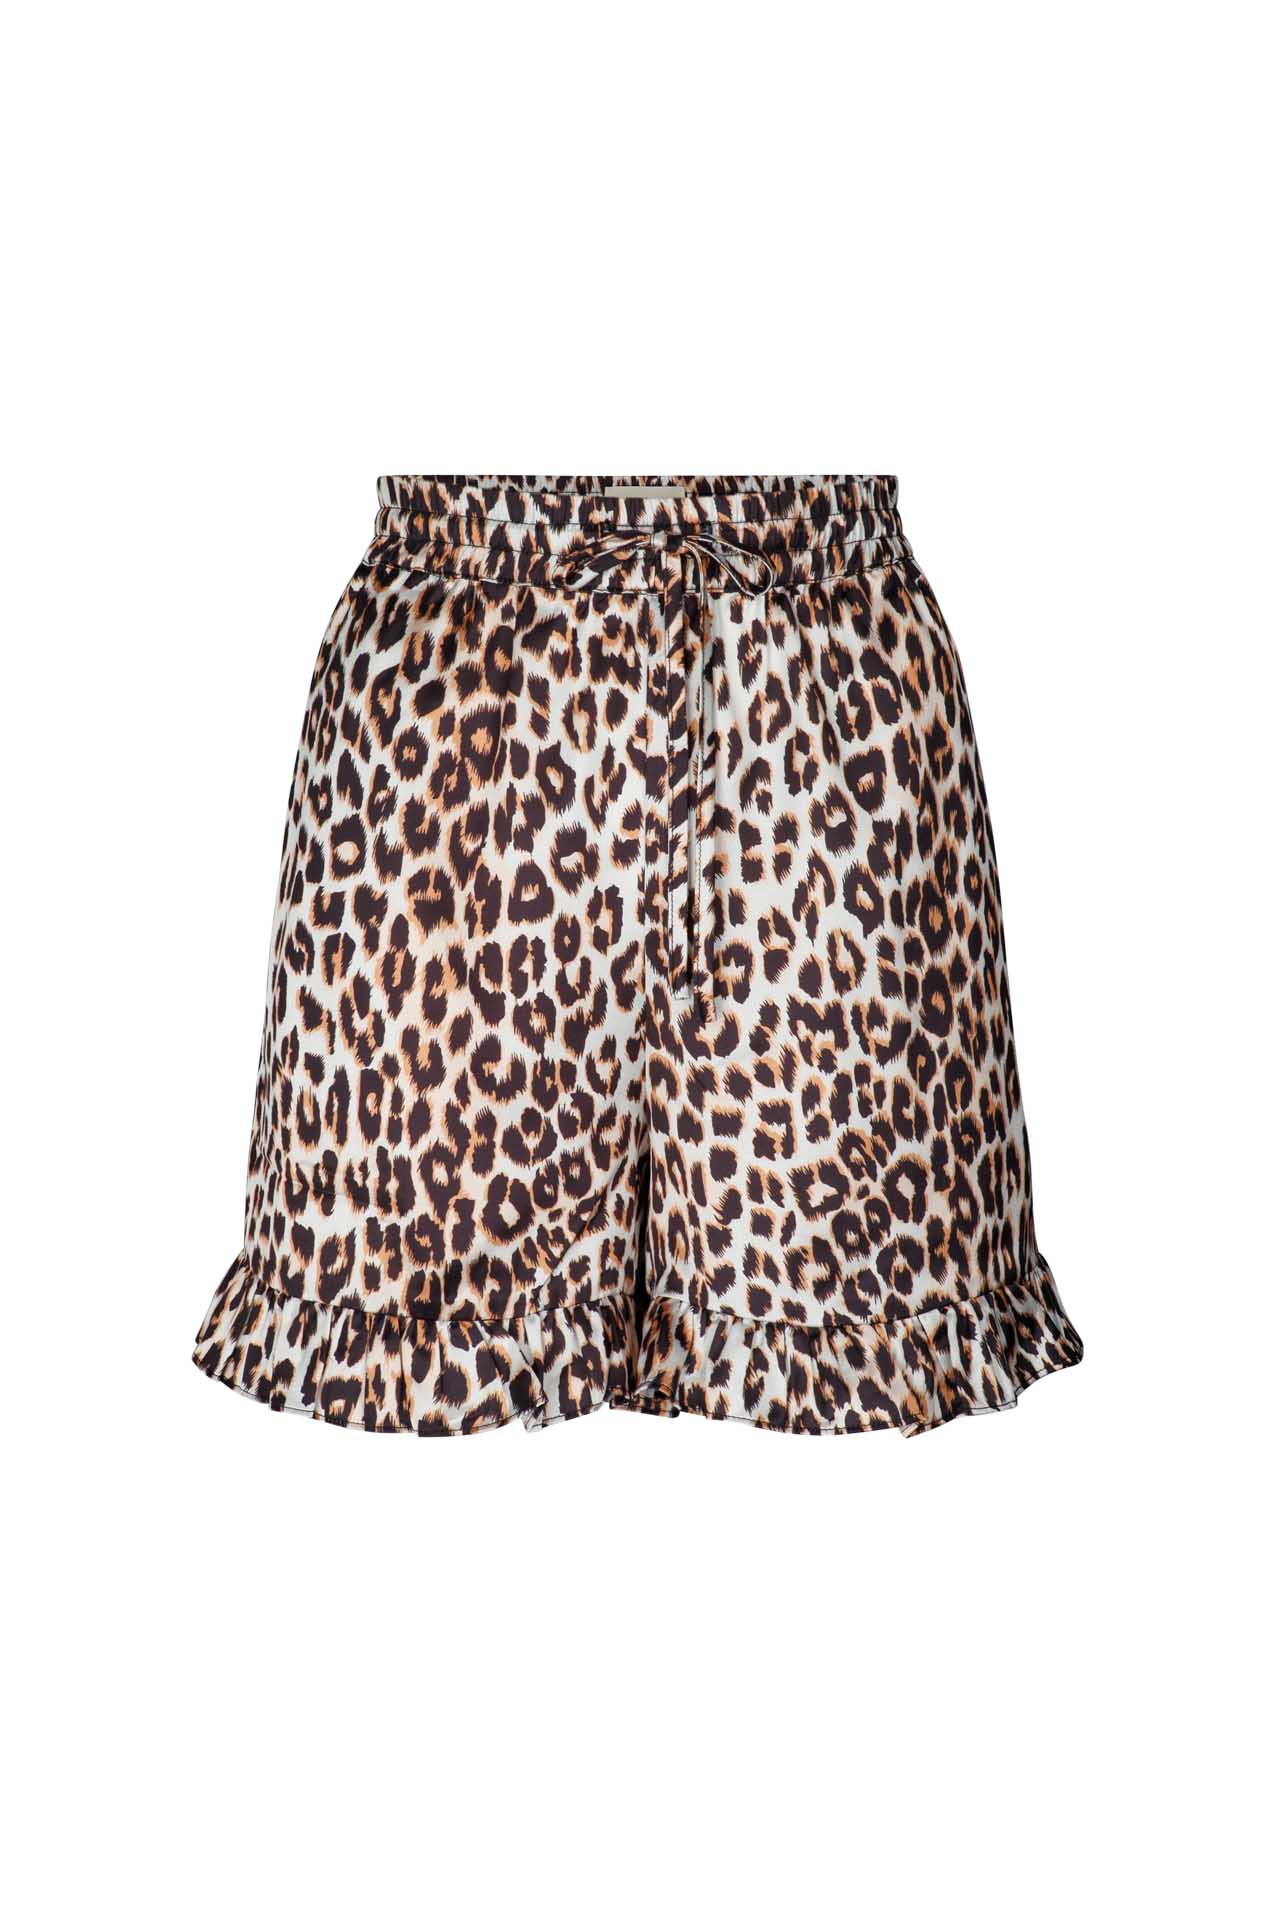 Lollys Laundry Ida shorts